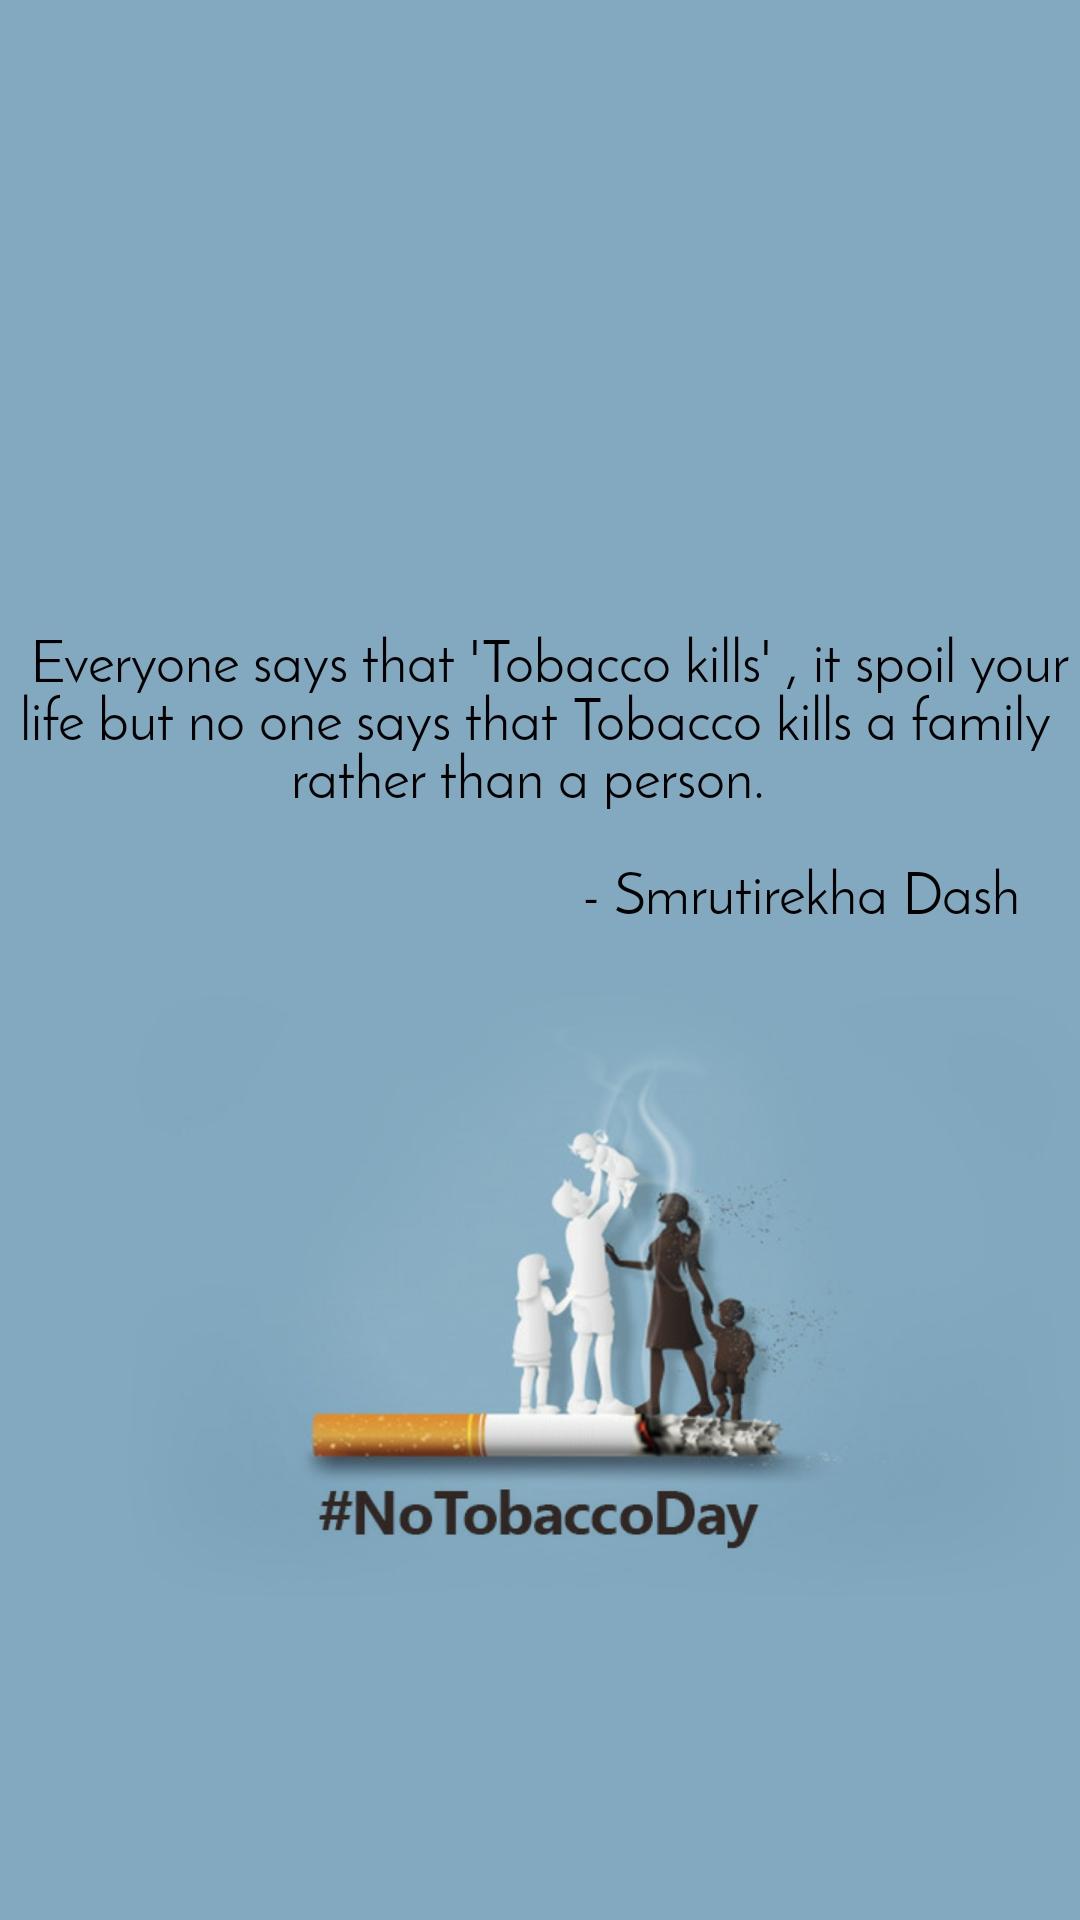 No Tobacco Day    Everyone says that 'Tobacco kills' , it spoil your life but no one says that Tobacco kills a family rather than a person.                                         - Smrutirekha Dash